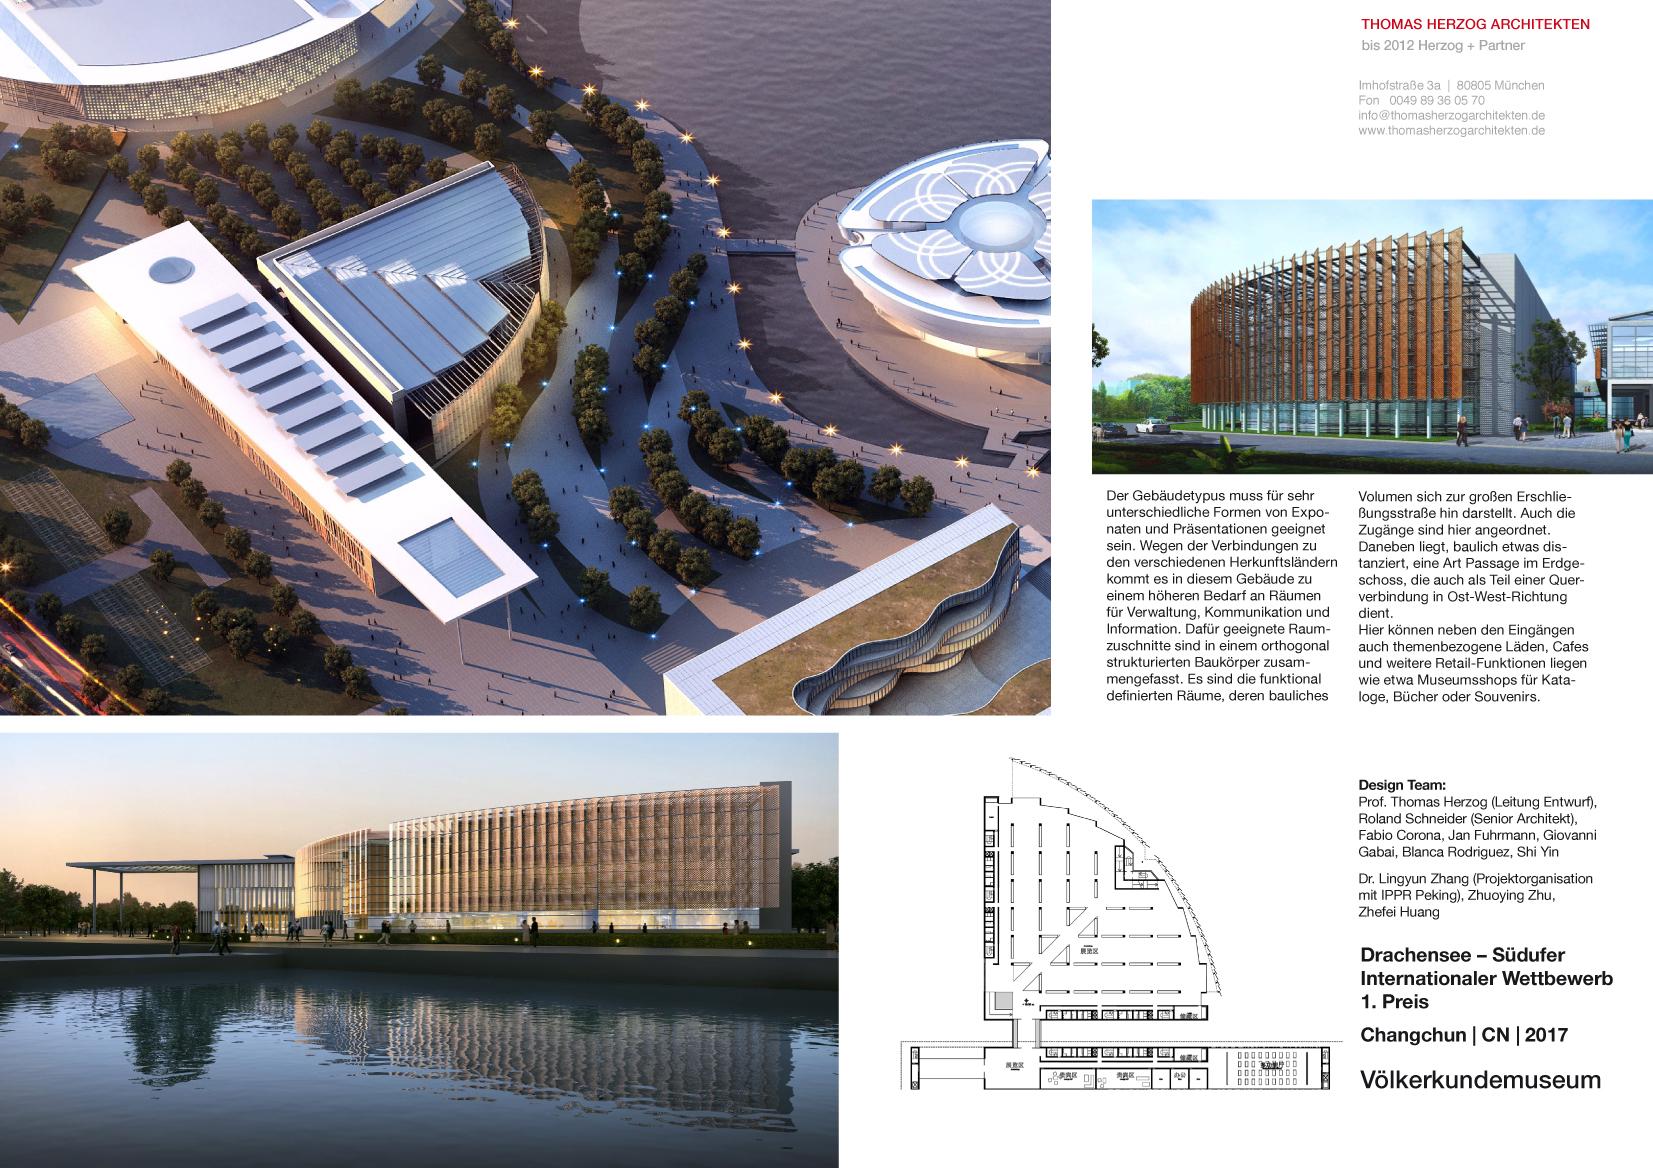 Völkerkunde Museum Changchun CN 2017 Internationaler Wettbewerb 1.Preis